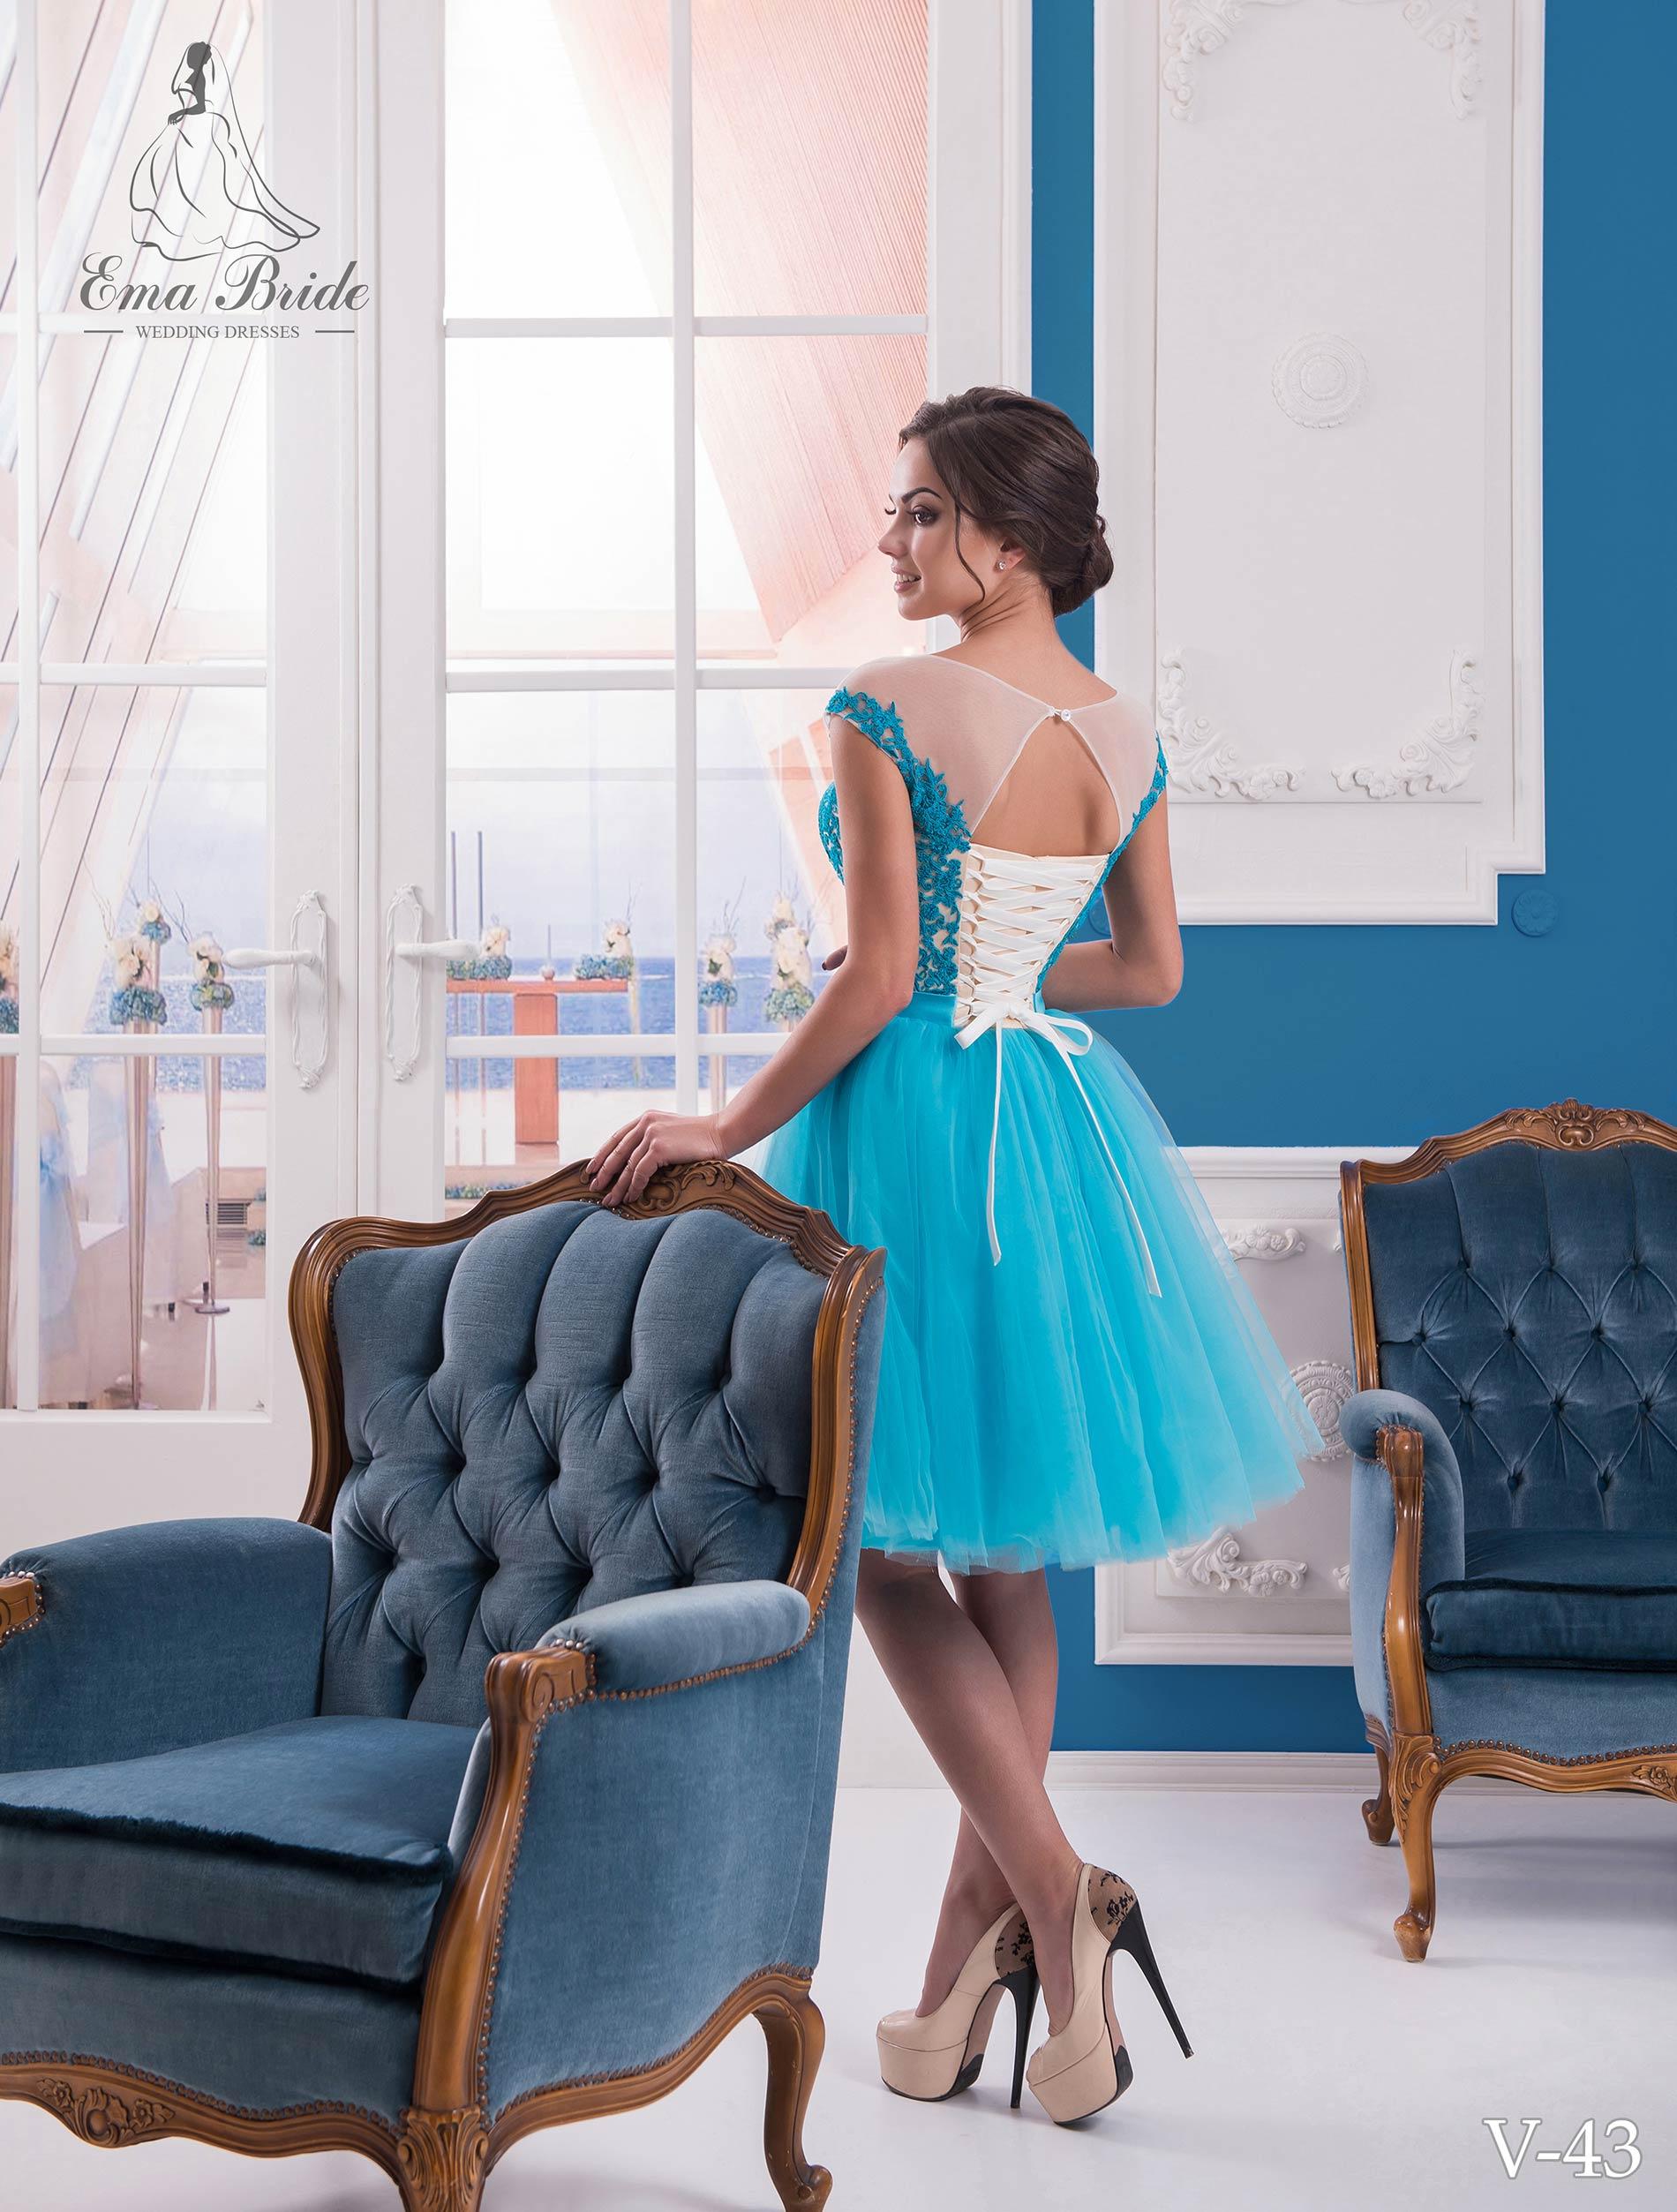 Evening dress v-43 on wholesale-2